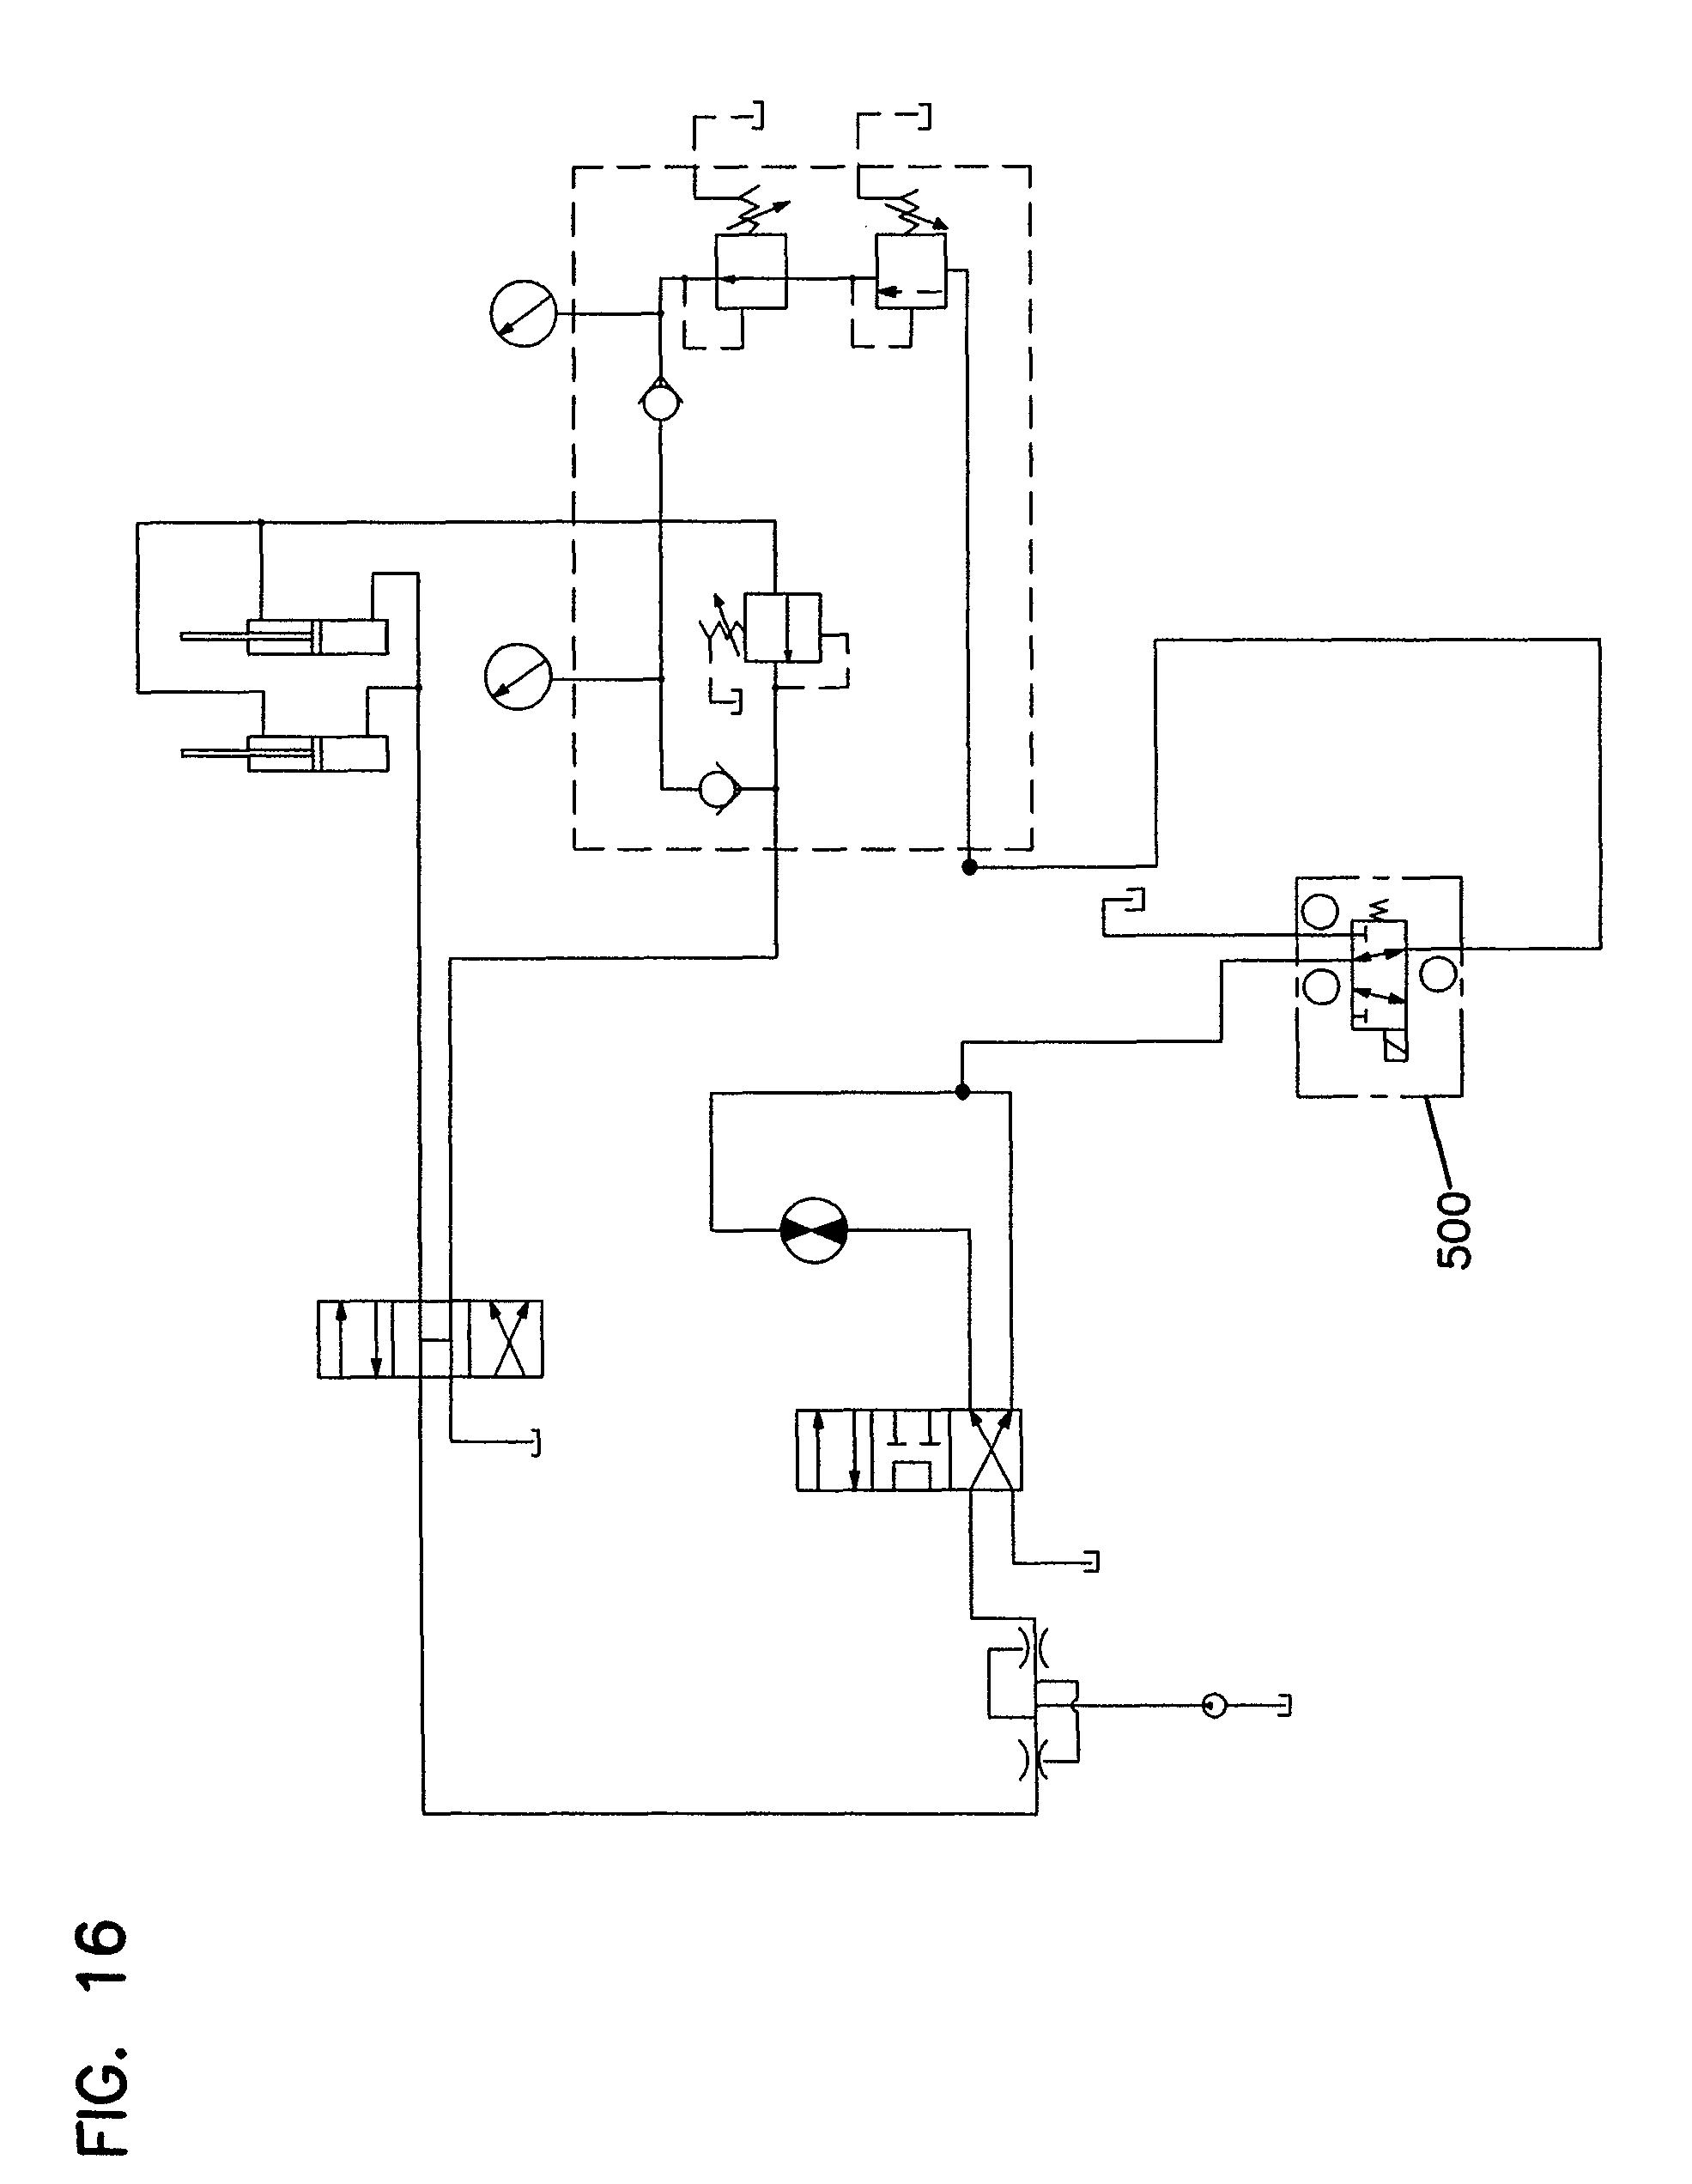 altec chipper wiring diagram wiring diagrams best altec chipper wiring diagram everything about wiring diagram u2022 ace wiring diagram altec chipper wiring